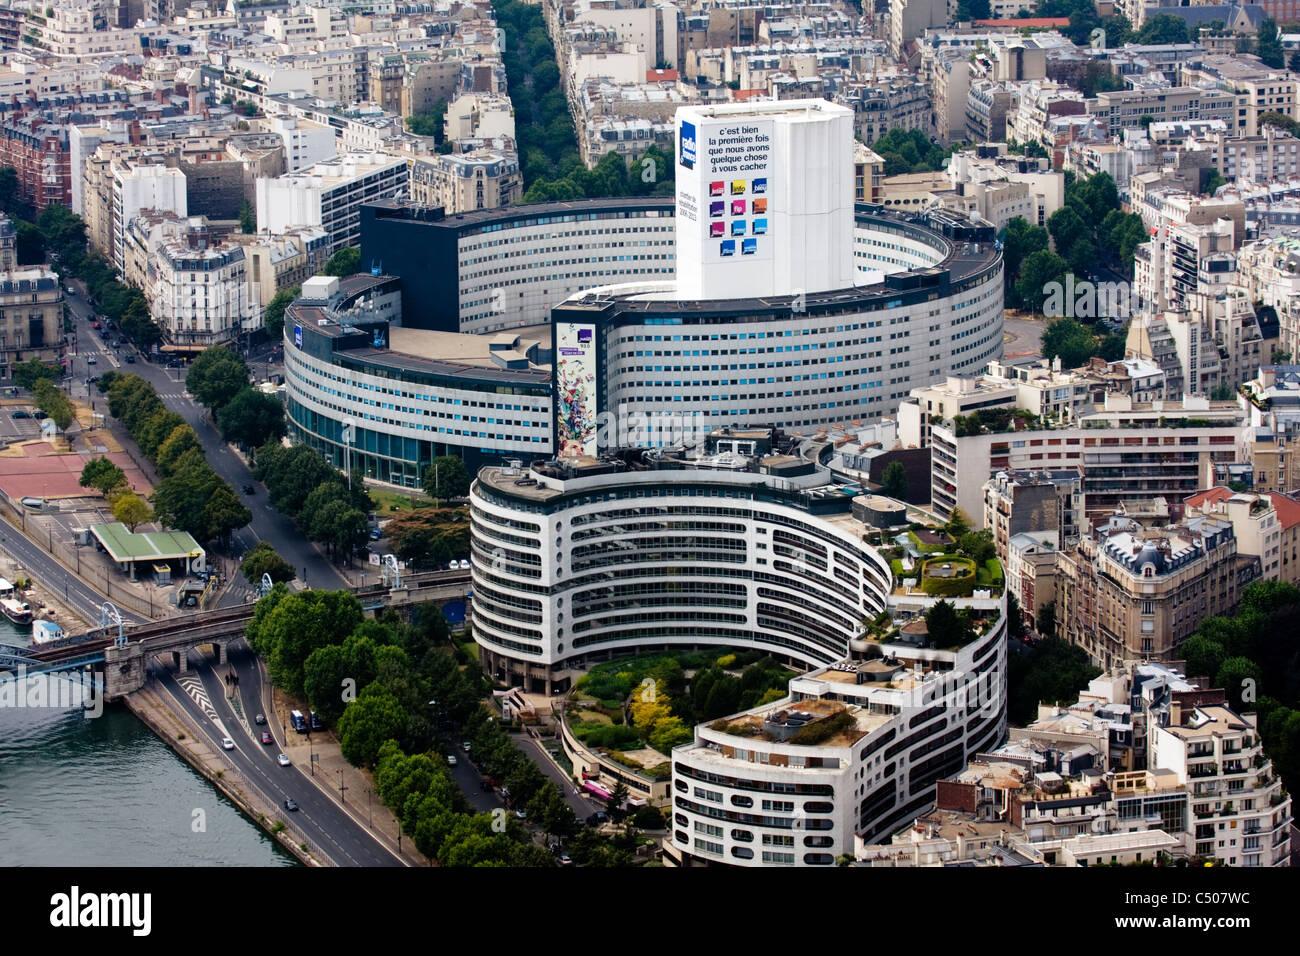 The Maison de la Radio (Radio France headquarters) seen from the